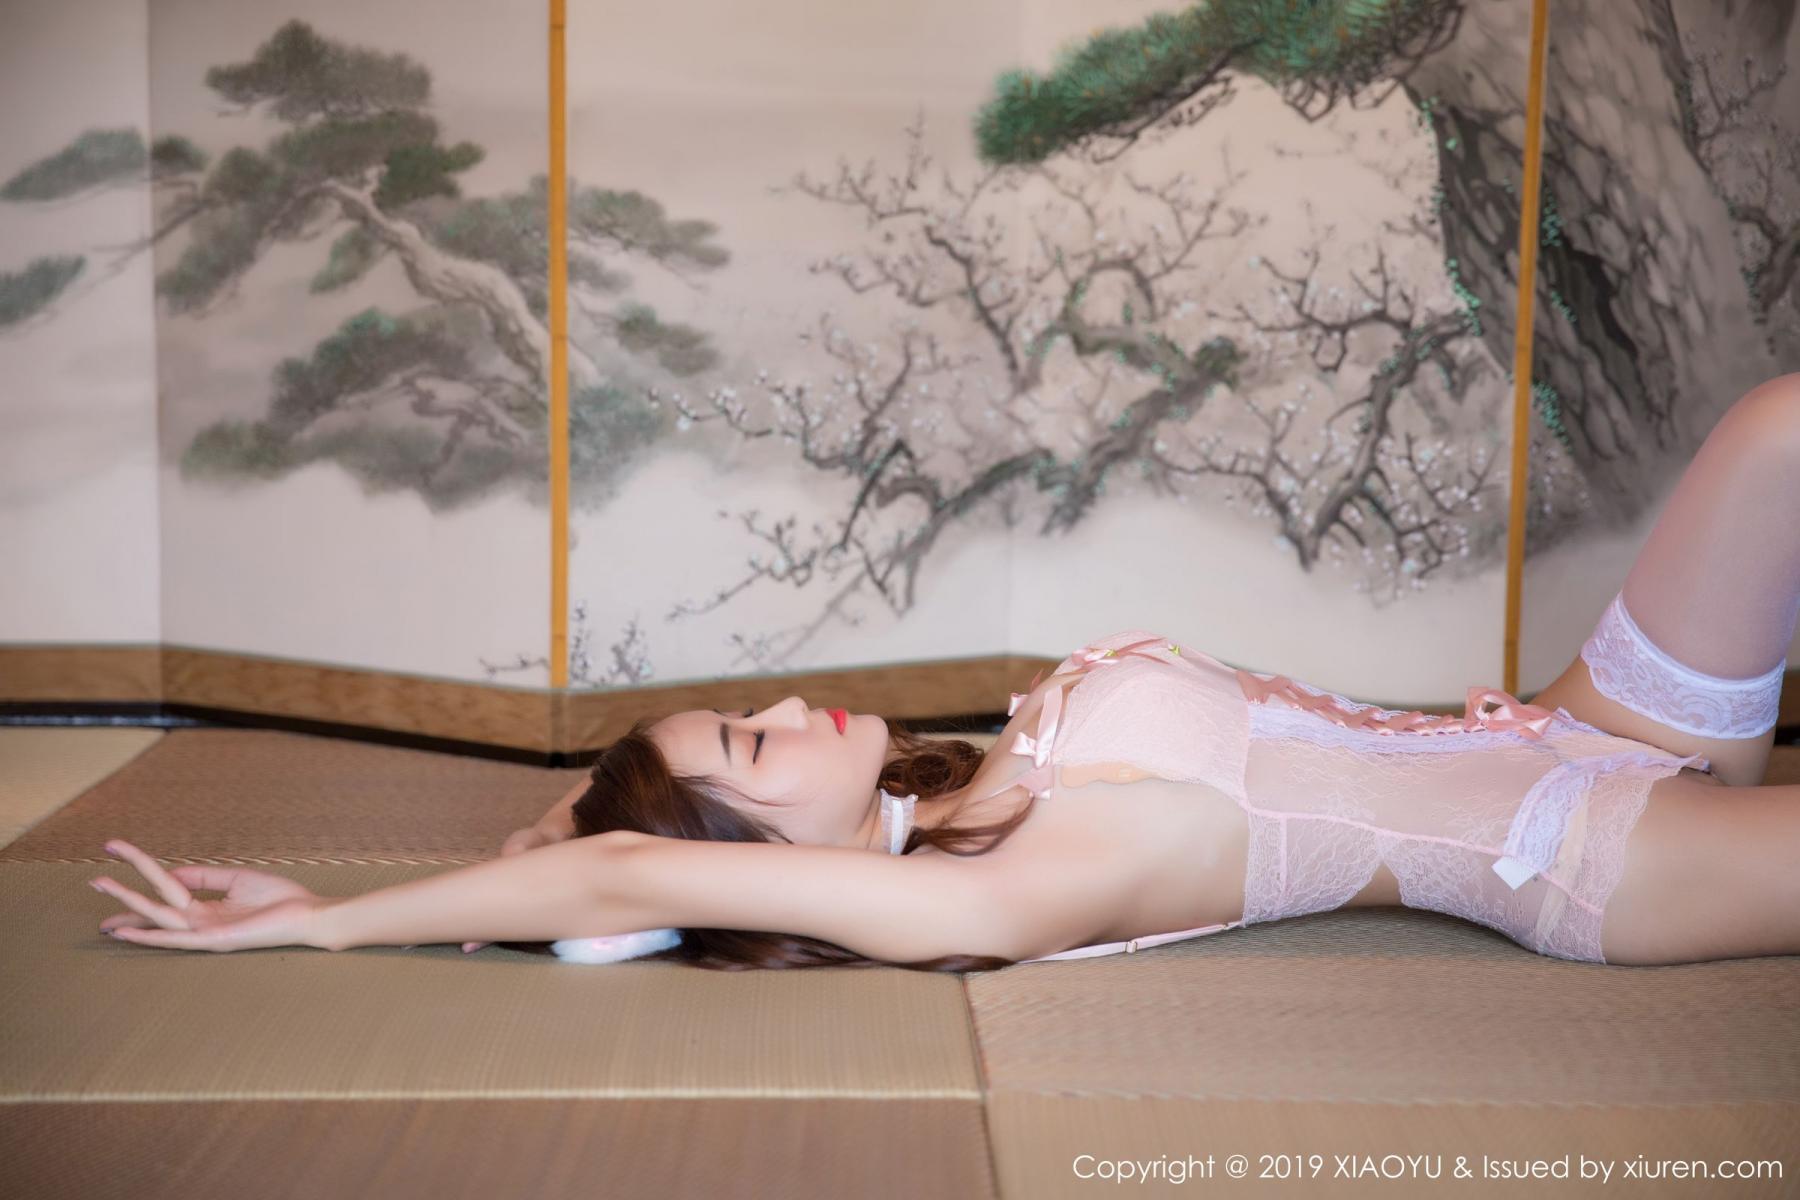 [XiaoYu] Vol.001 Hu Ya Mao Bao 3P, Hu Ya Mao Bao, Tall, Underwear, XiaoYu